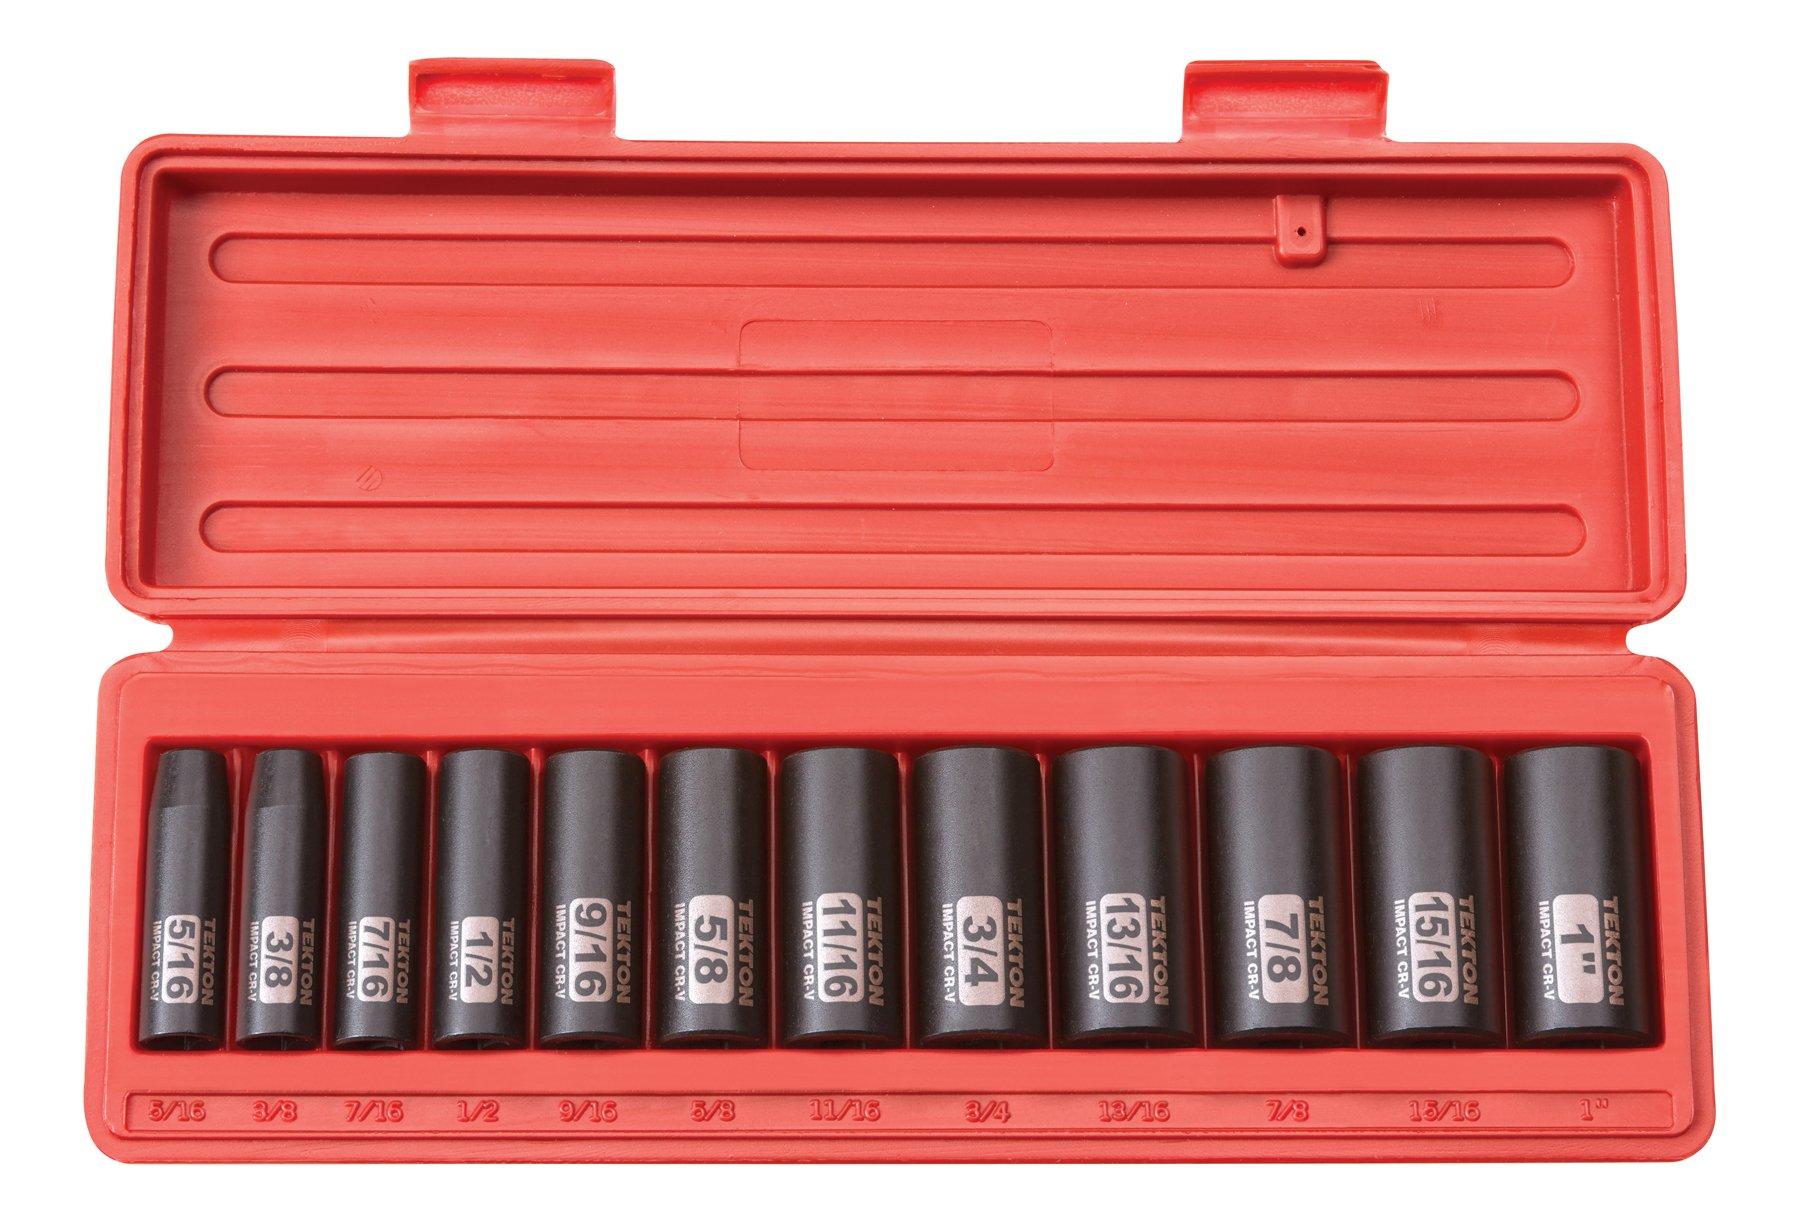 TEKTON 3/8-Inch Drive Deep Impact Socket Set, Inch, Cr-V, 6-Point, 5/16-Inch - 1-Inch, 12-Sockets   47920